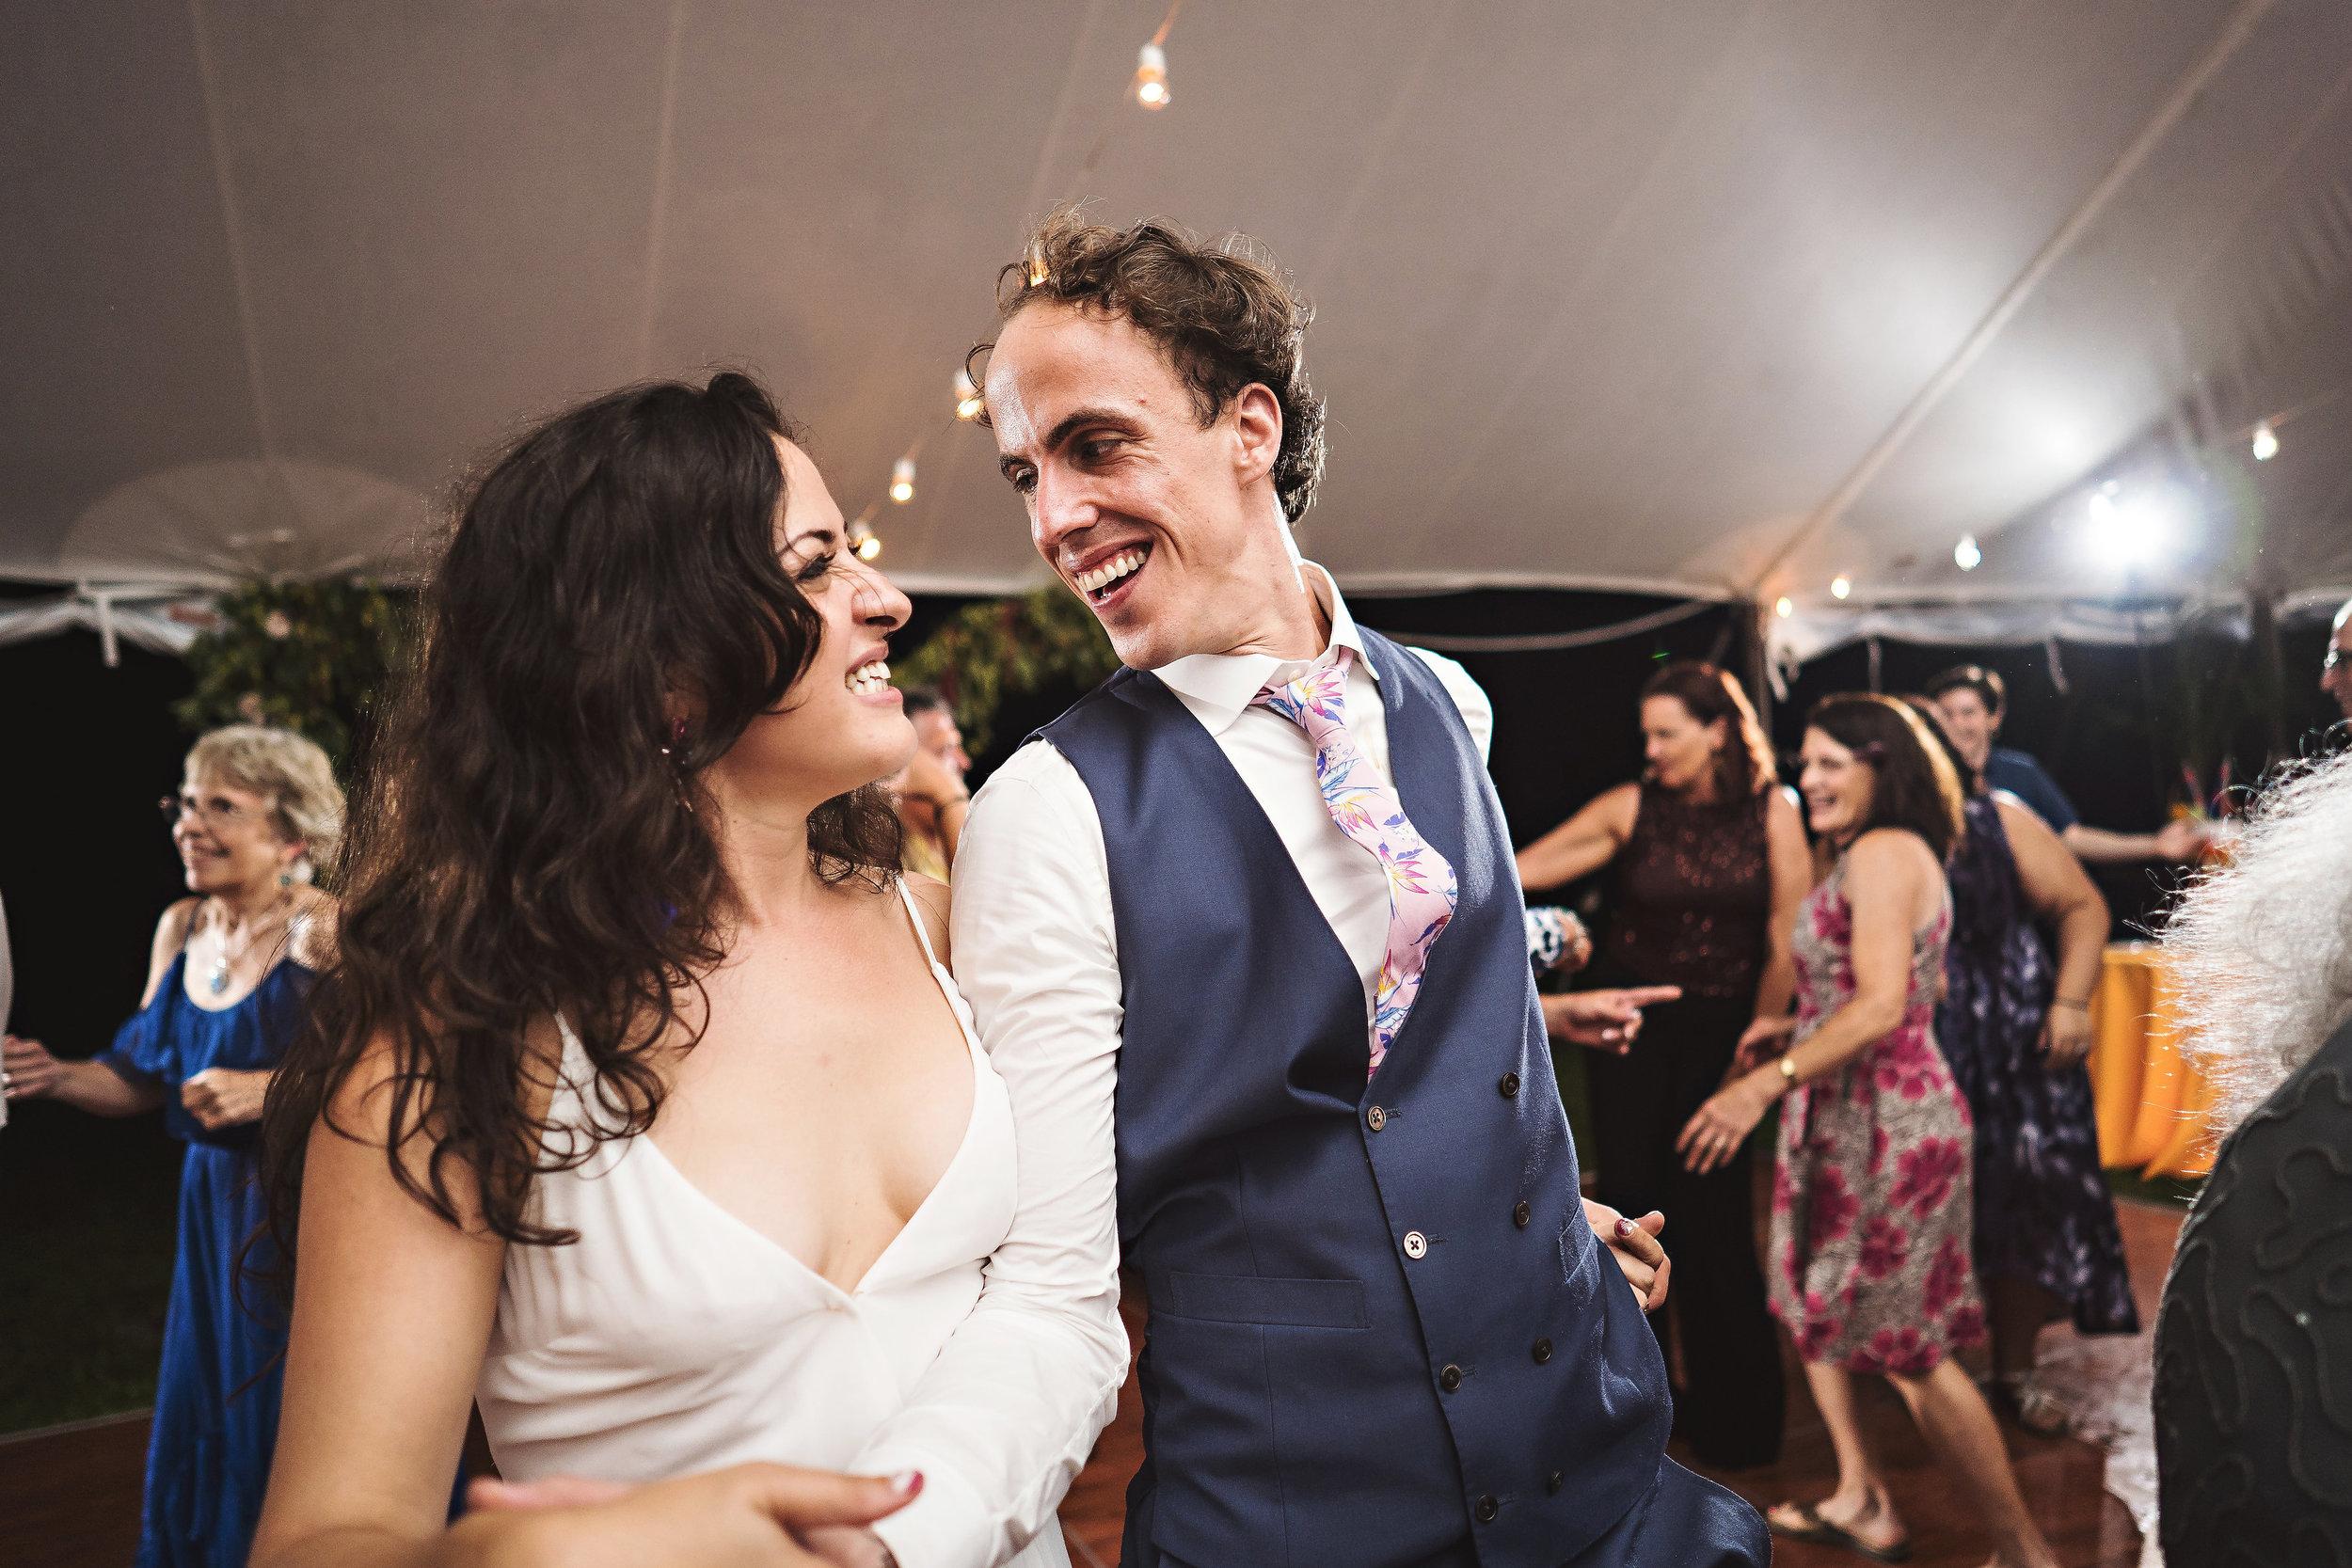 upstate-ny-wedding-jove-meyer-events-inbal-sivan-0130.jpg